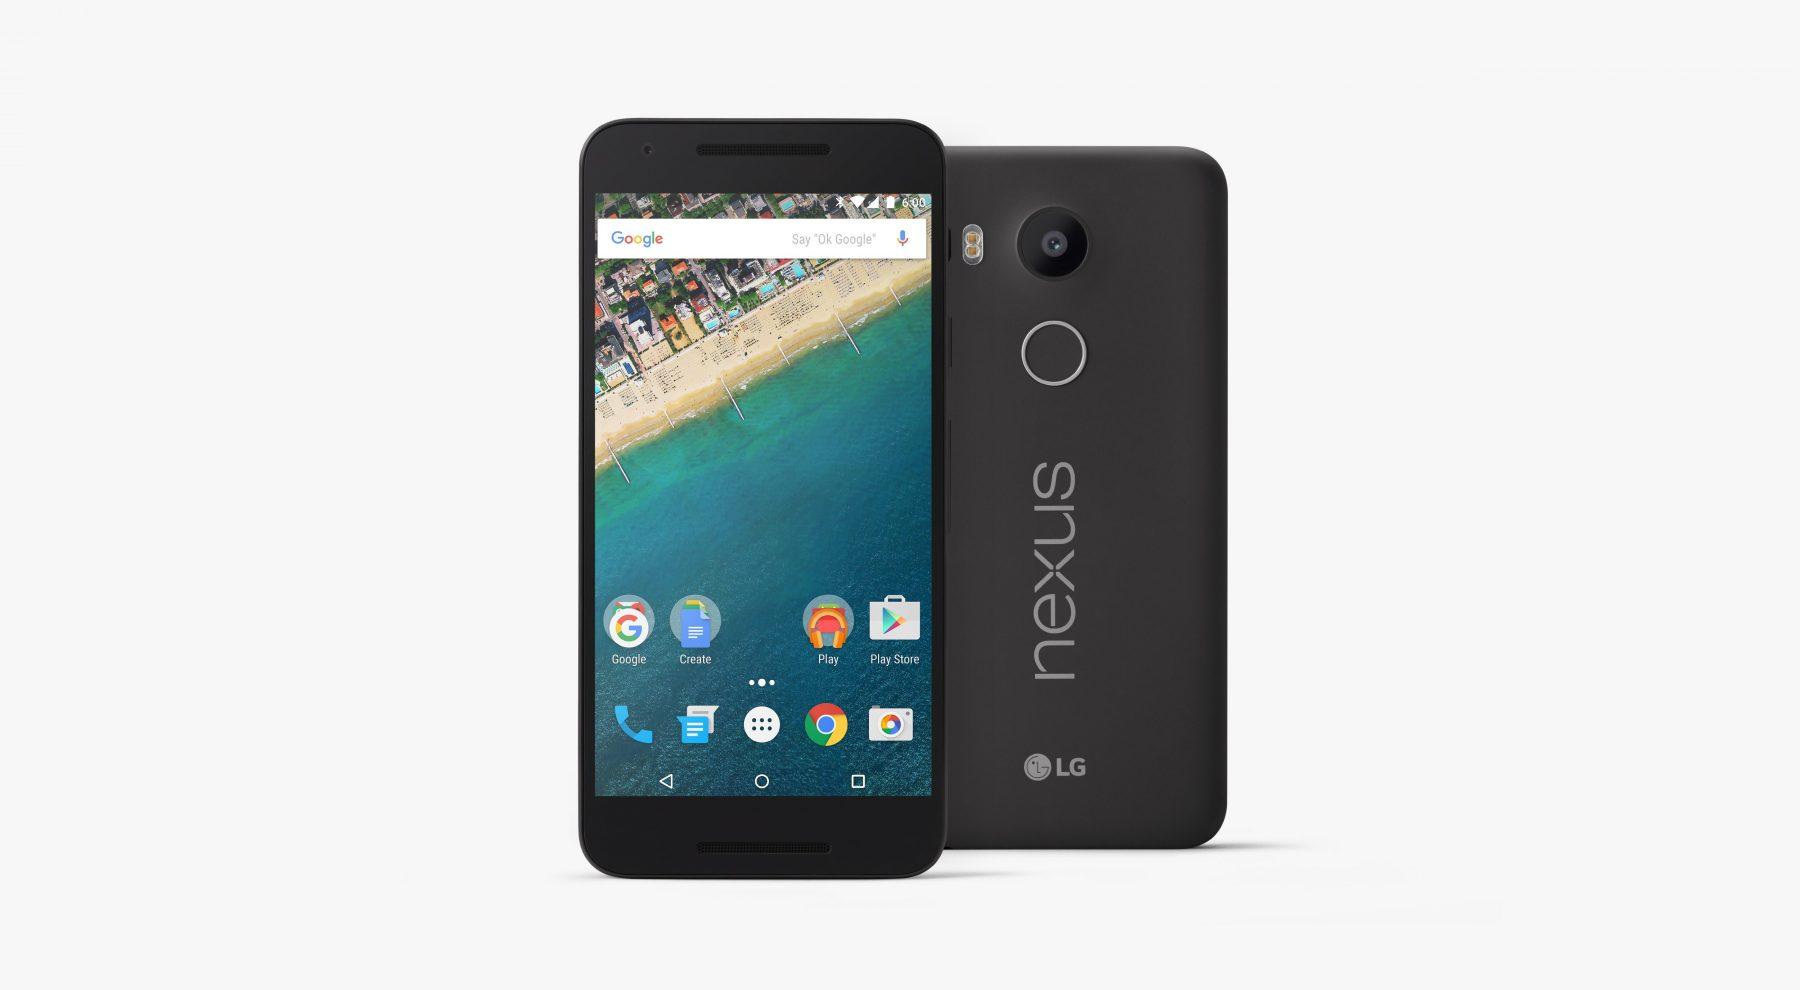 Tabletowo.pl Promocja: Nexus 5X 32 GB za 1999 zł Android Google LG Promocje Smartfony